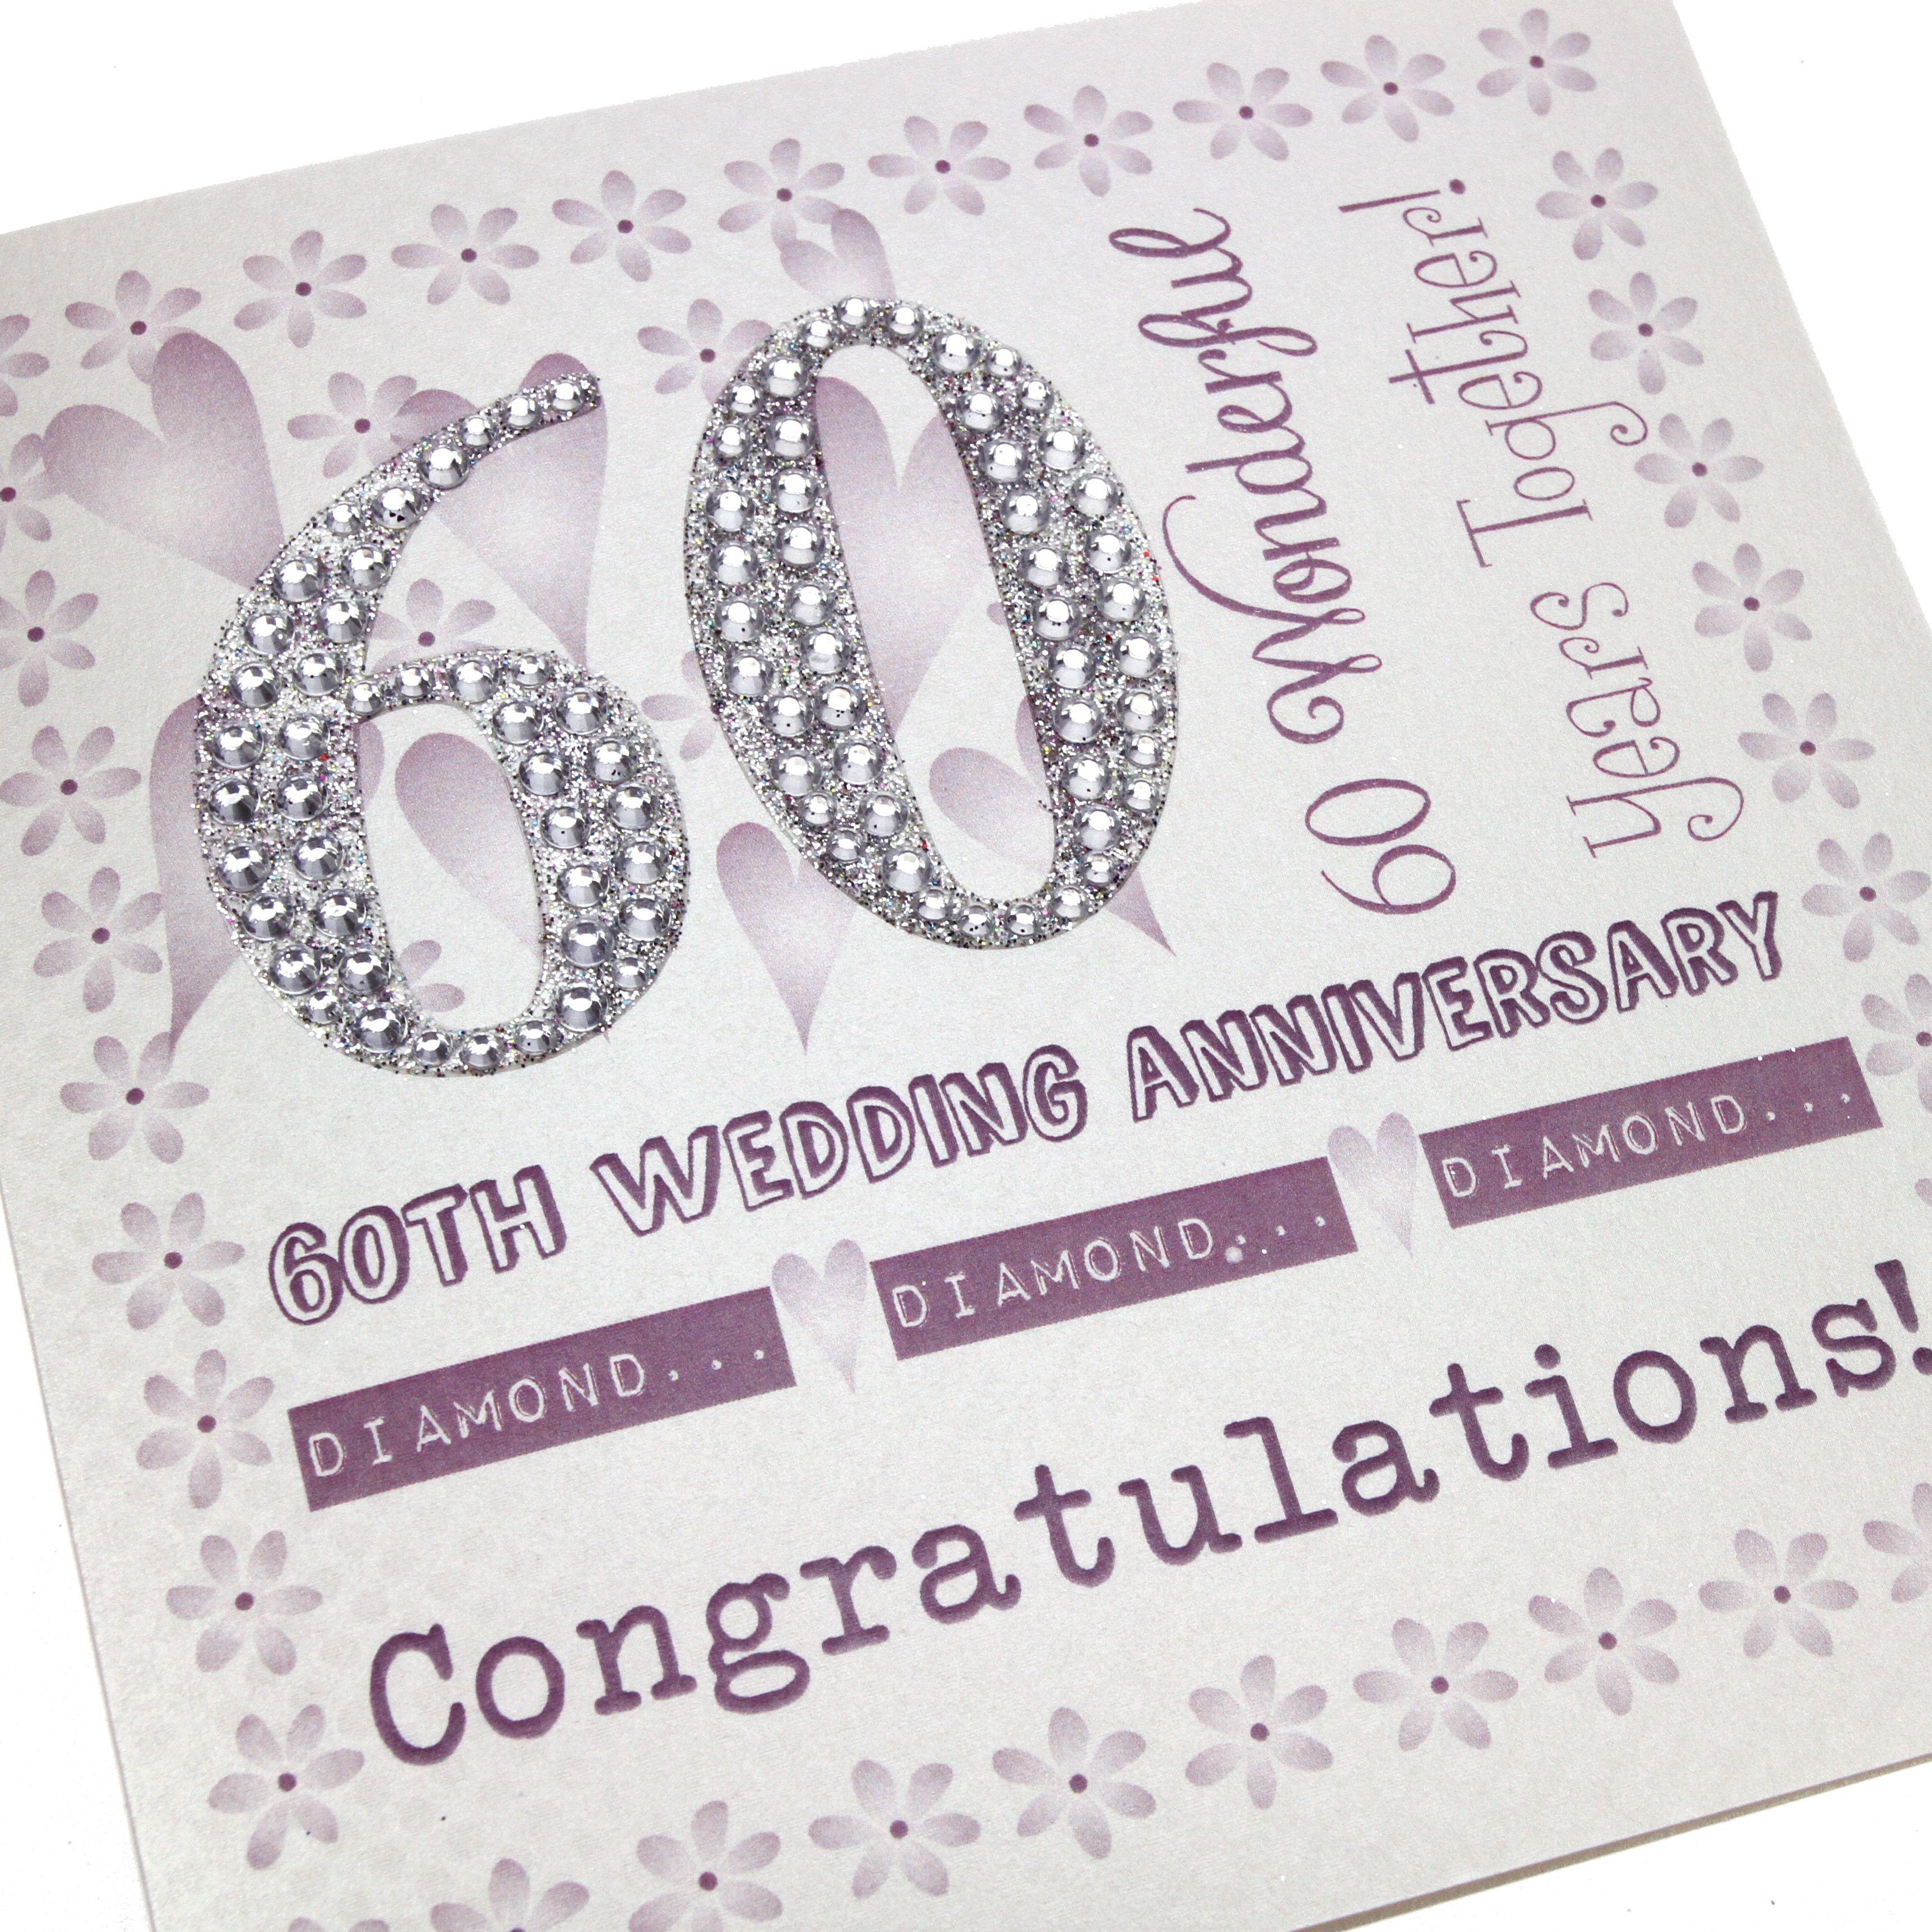 Handmade Diamond Anniversary Card Purple Floral Border Embossed Silver Glittery Numbers